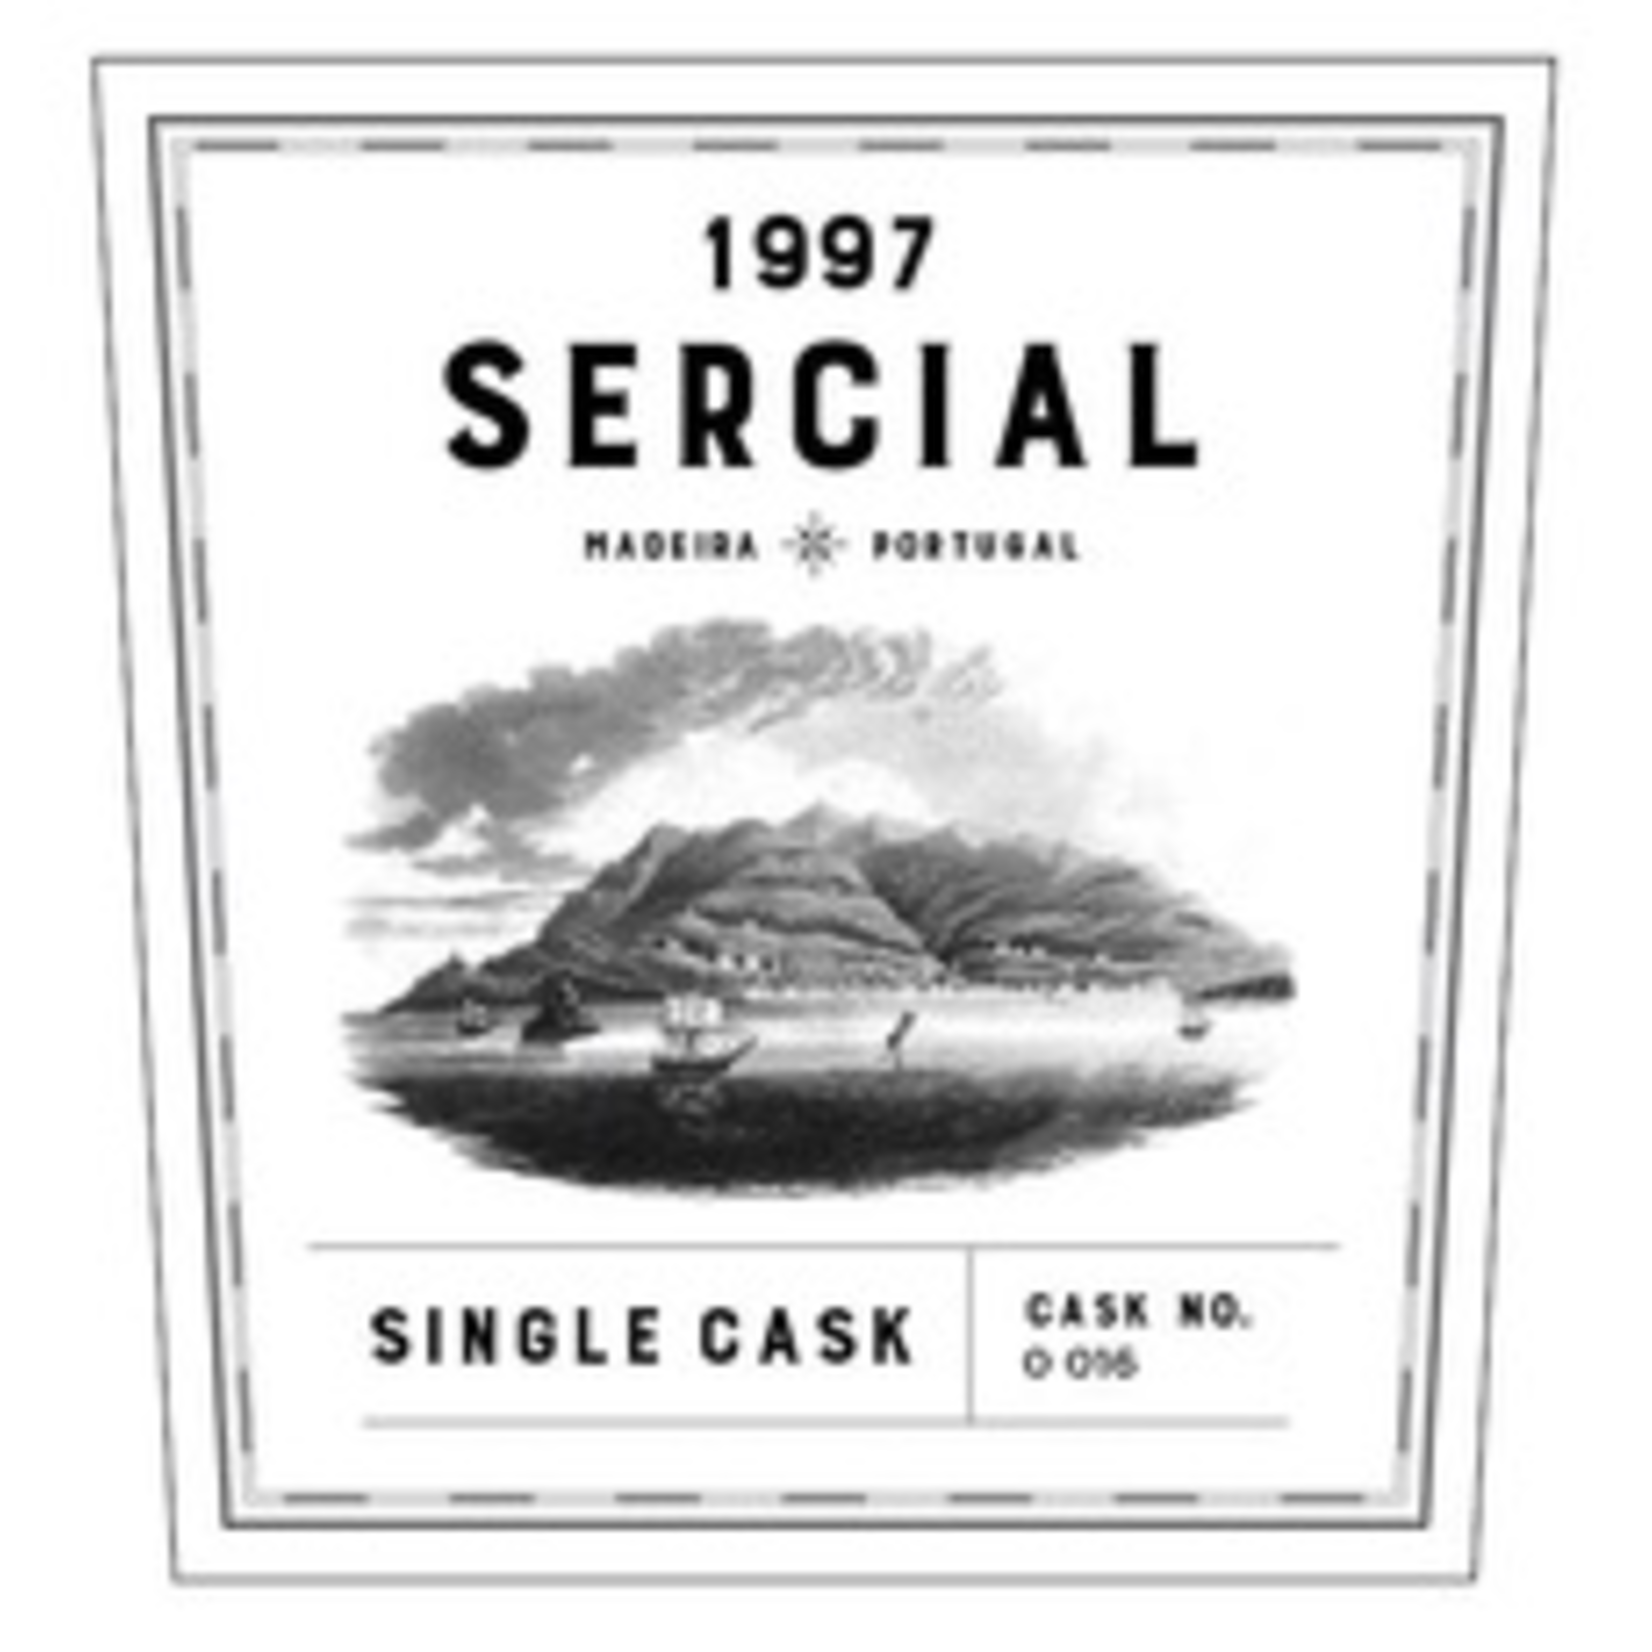 Wine Broadbent Single Cask Sercial Madeira Cask No 017 1997 500ml